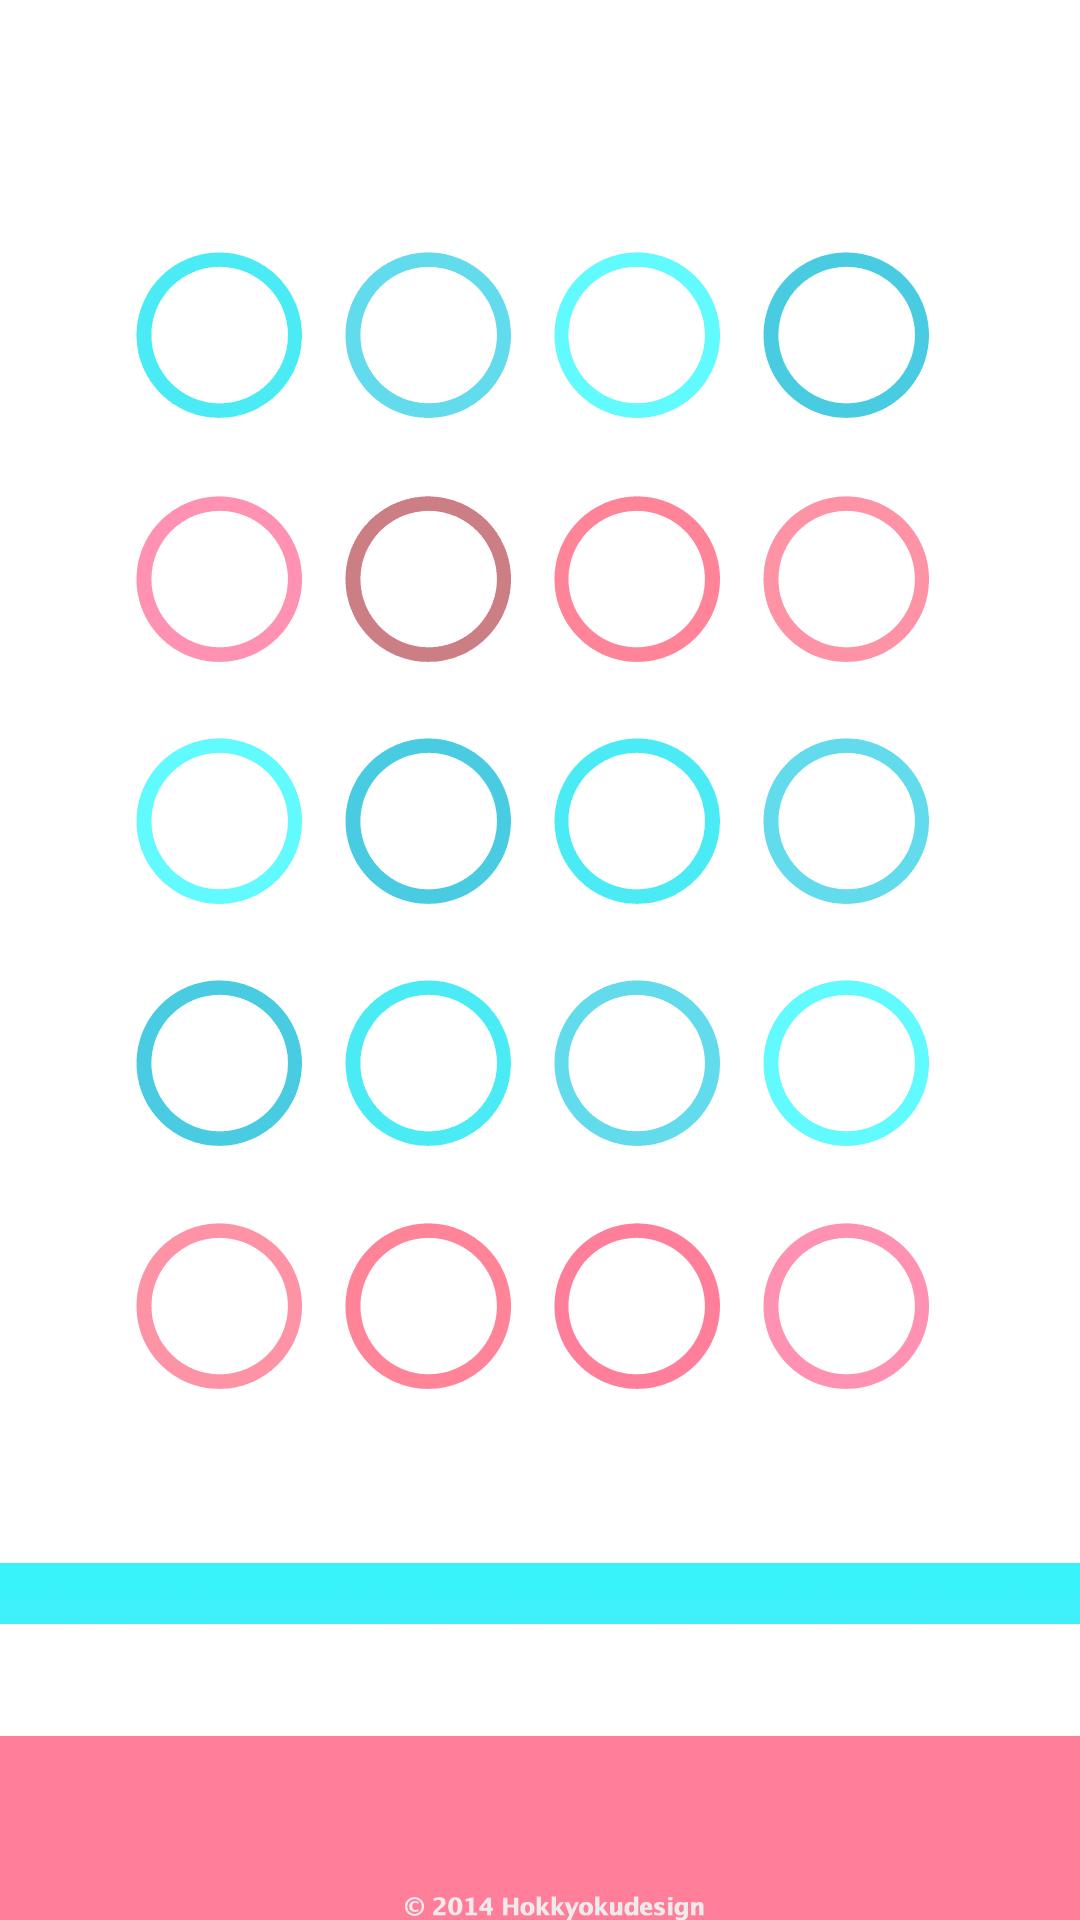 Ios Iphone画面用待受け壁紙 棚とドックにシアン ローズ 輪 Circle Wallpaper Iphone